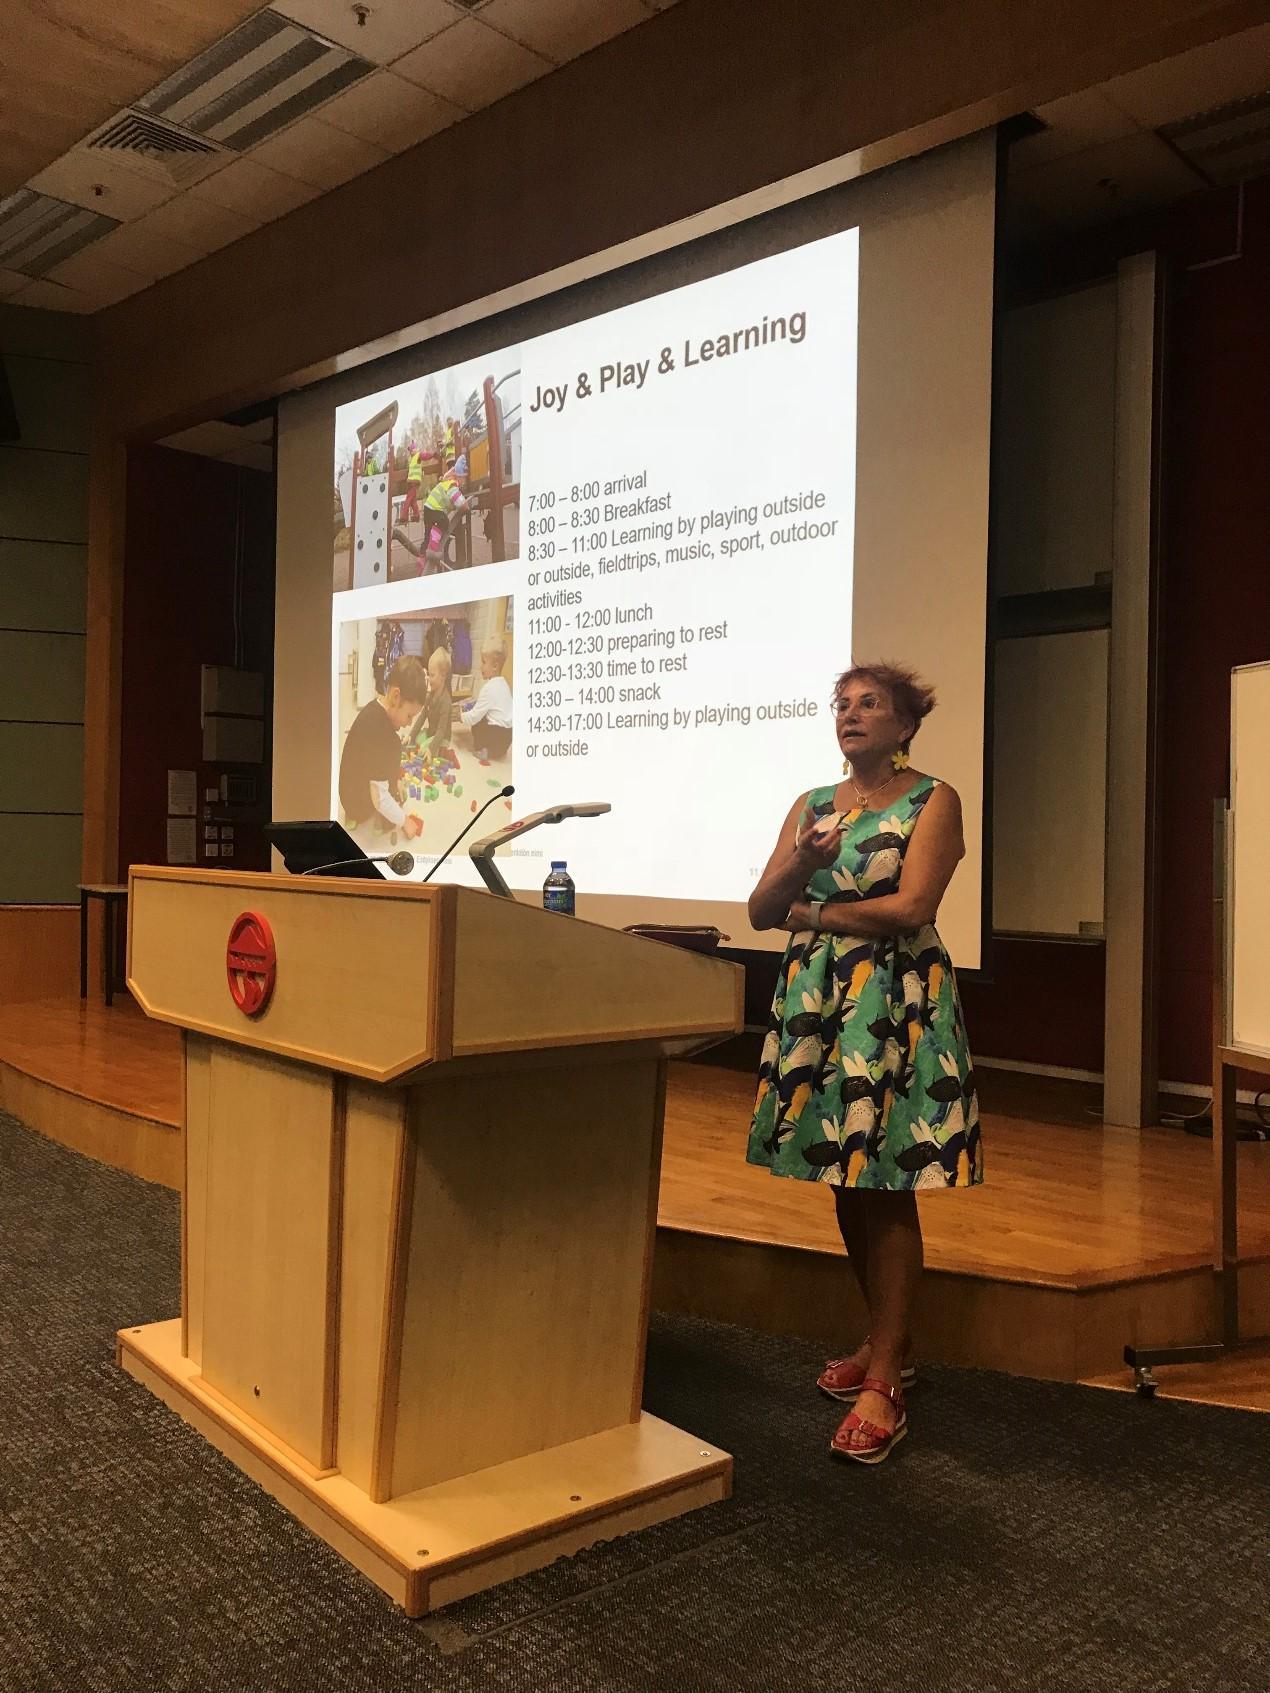 LIFE邀請赫爾辛基大學的Nina Sajaniemi教授,與同學作專業分享,介紹赫爾辛基幼兒自由遊戲的概念。(相片由 LIFE 提供)